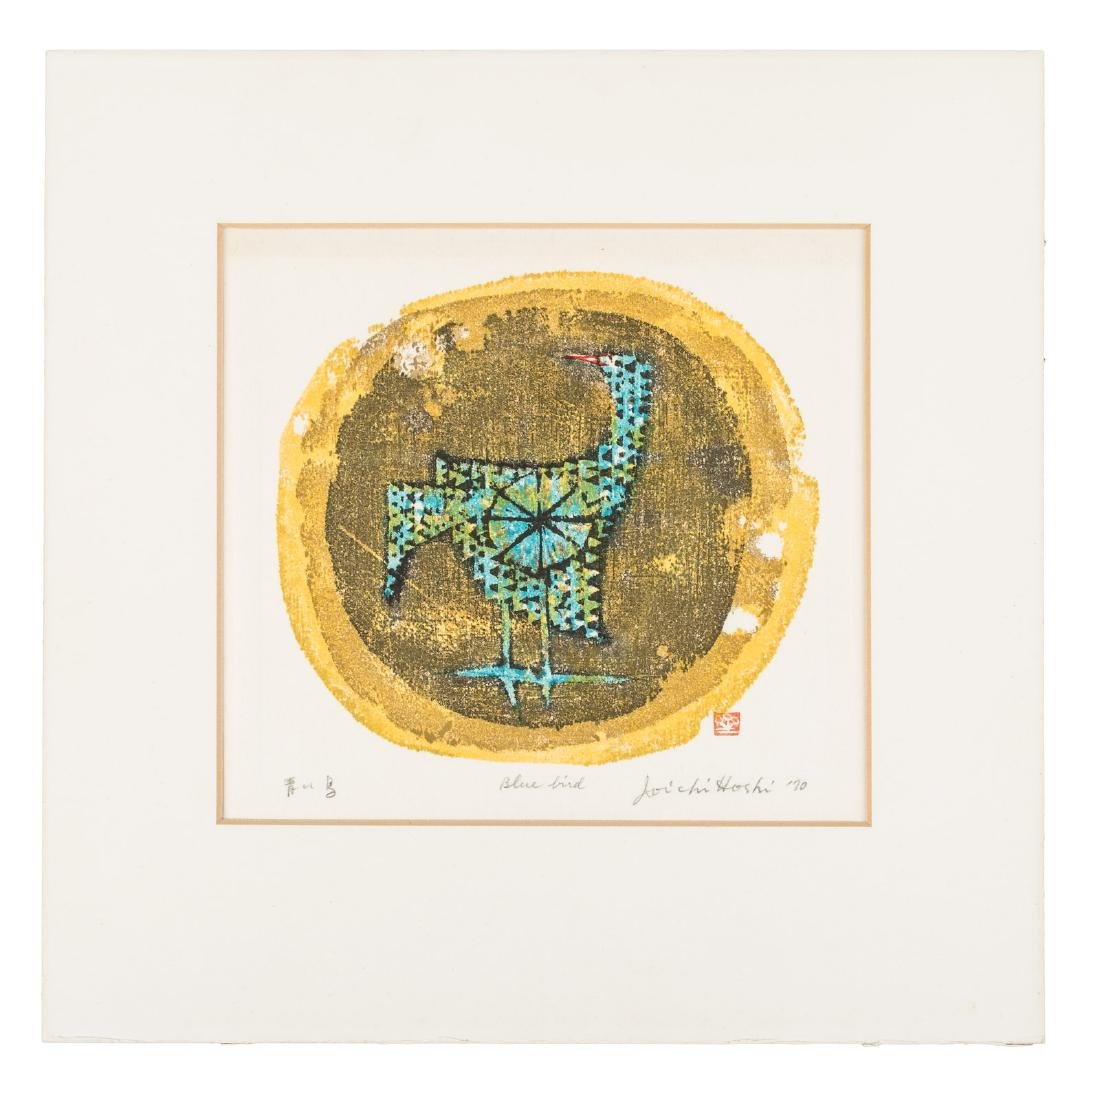 Joichi Hoshi, color woodcut